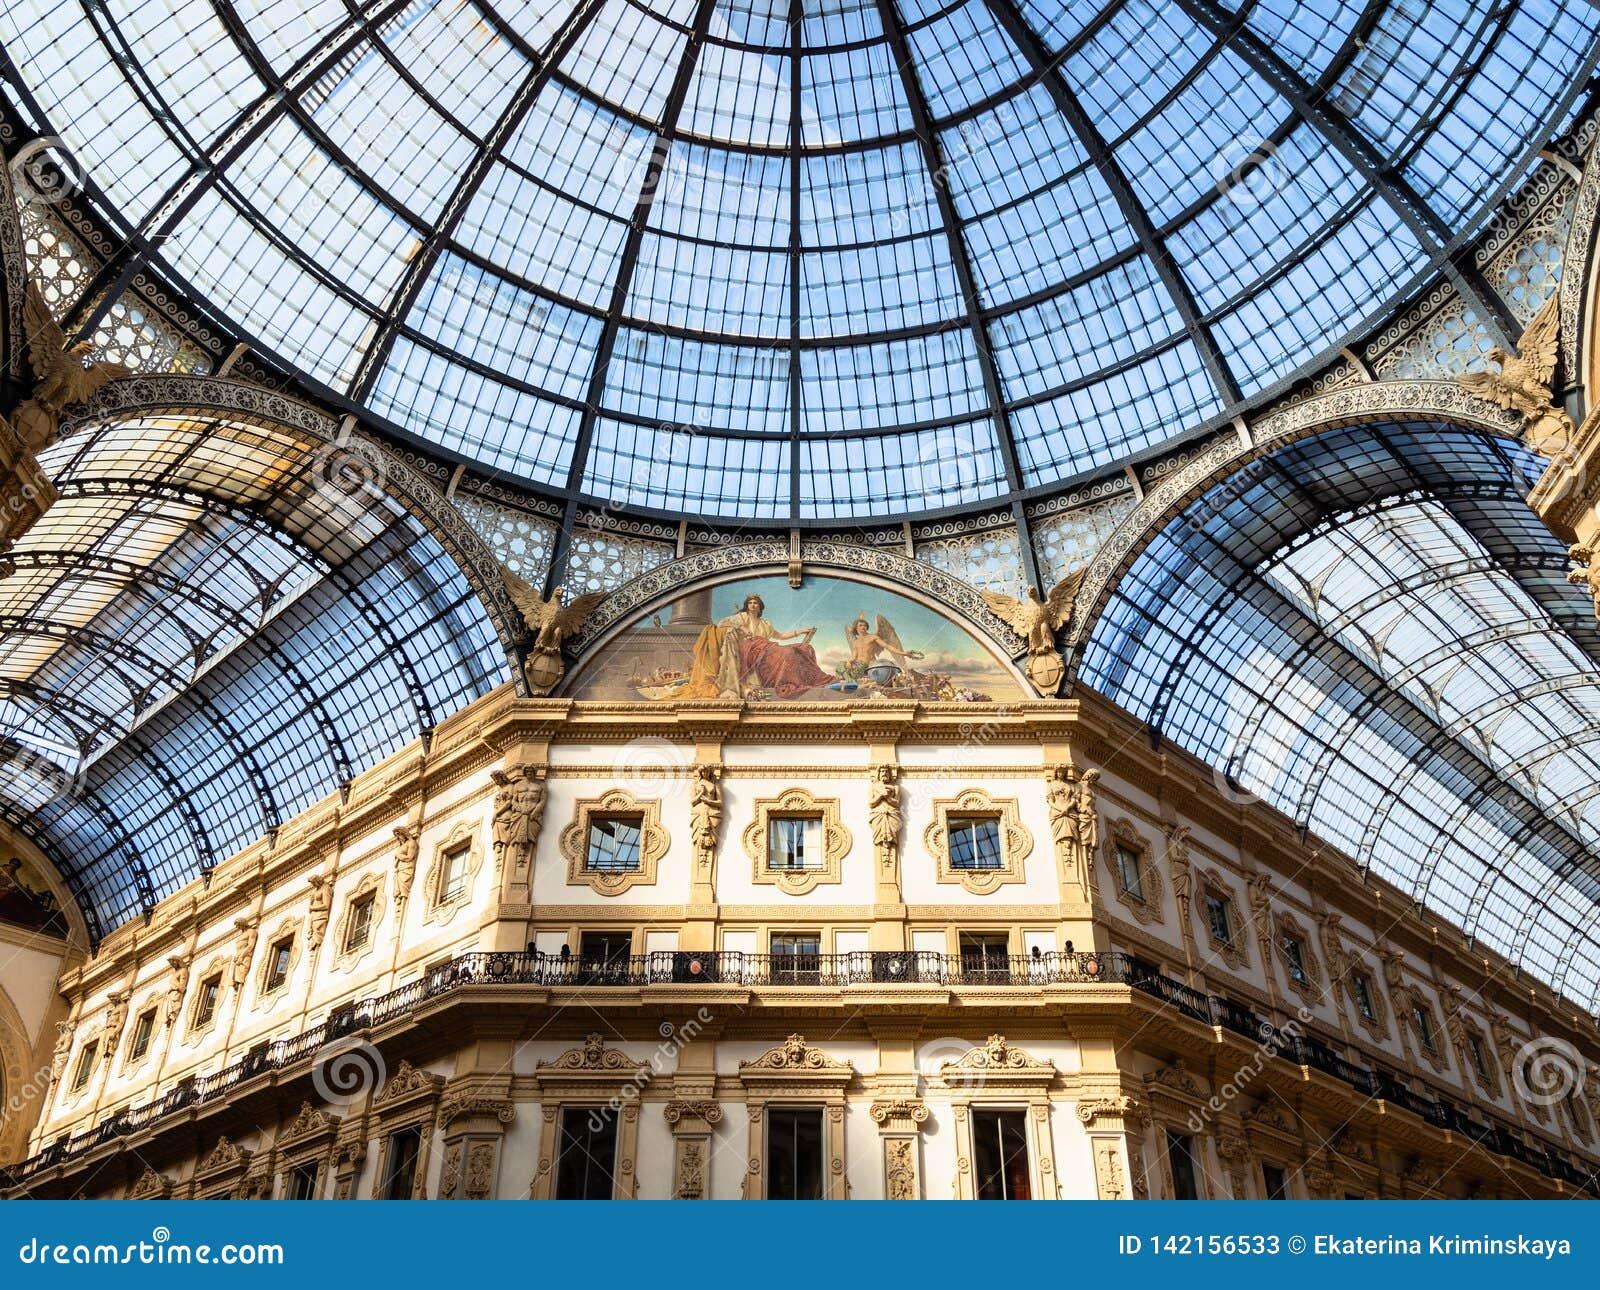 Glasdecke von Galleria Vittorio Emanuele II